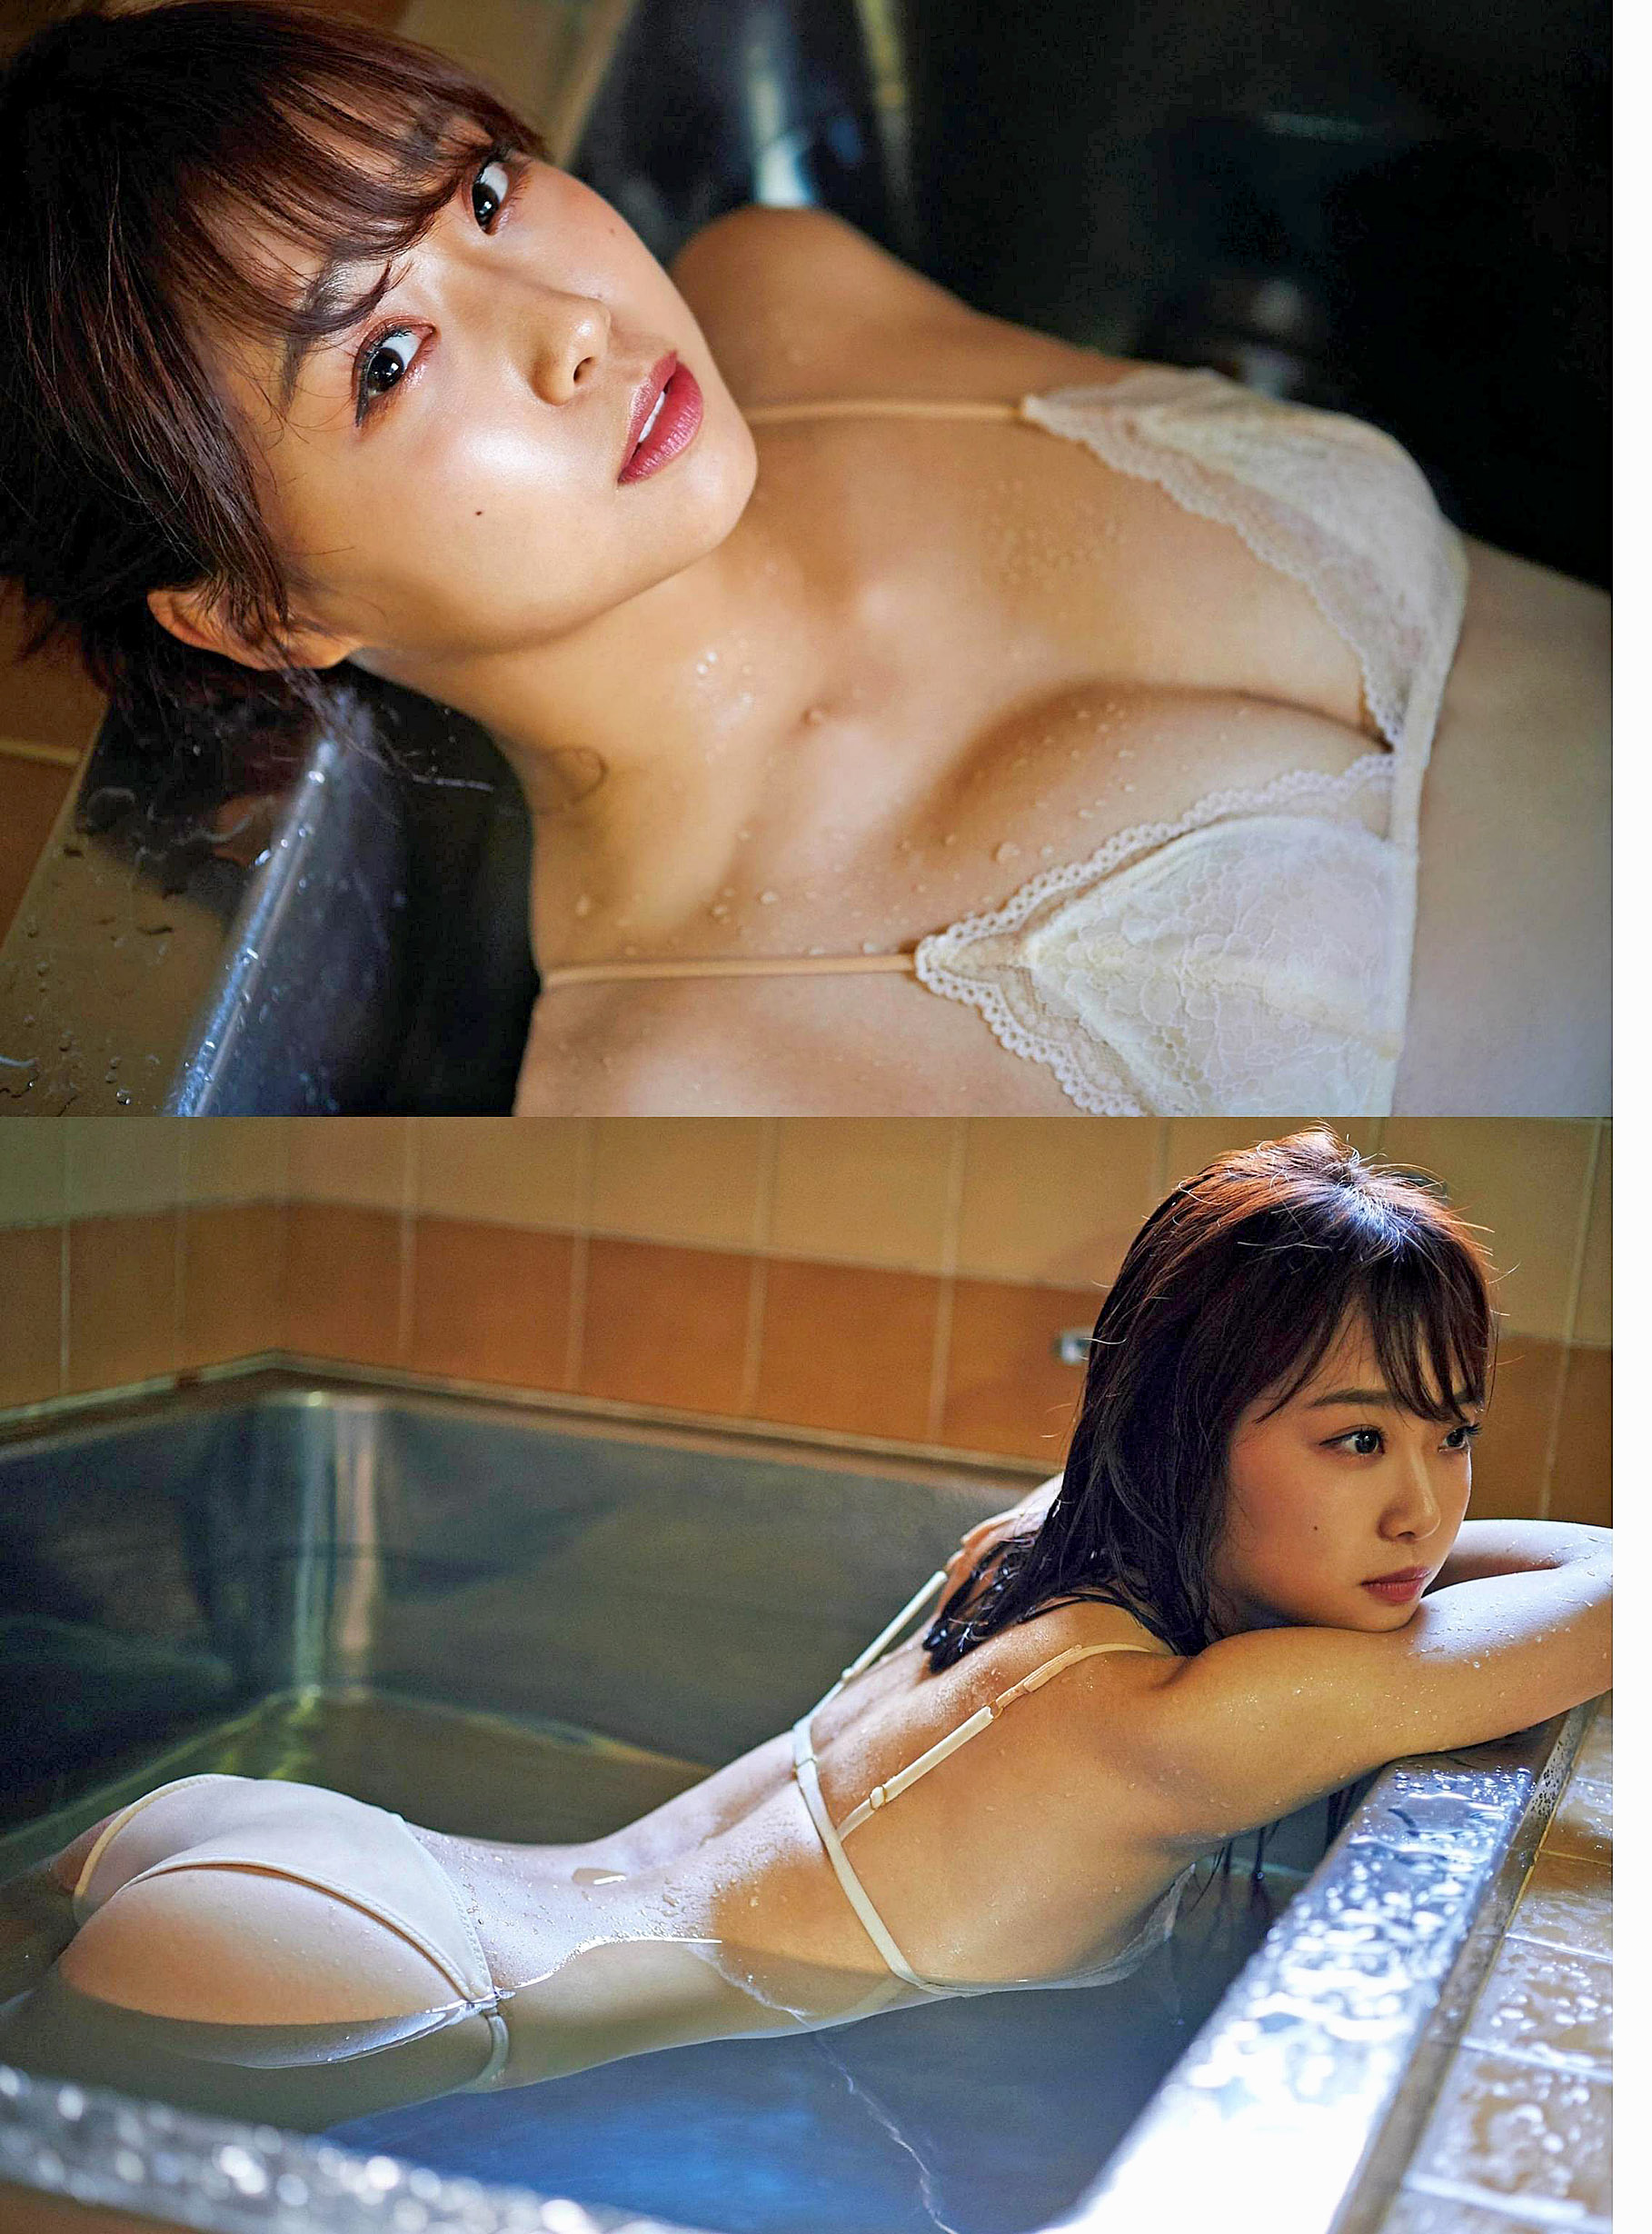 Yuuka Kato NMB48 EnTame 2001 06.jpg